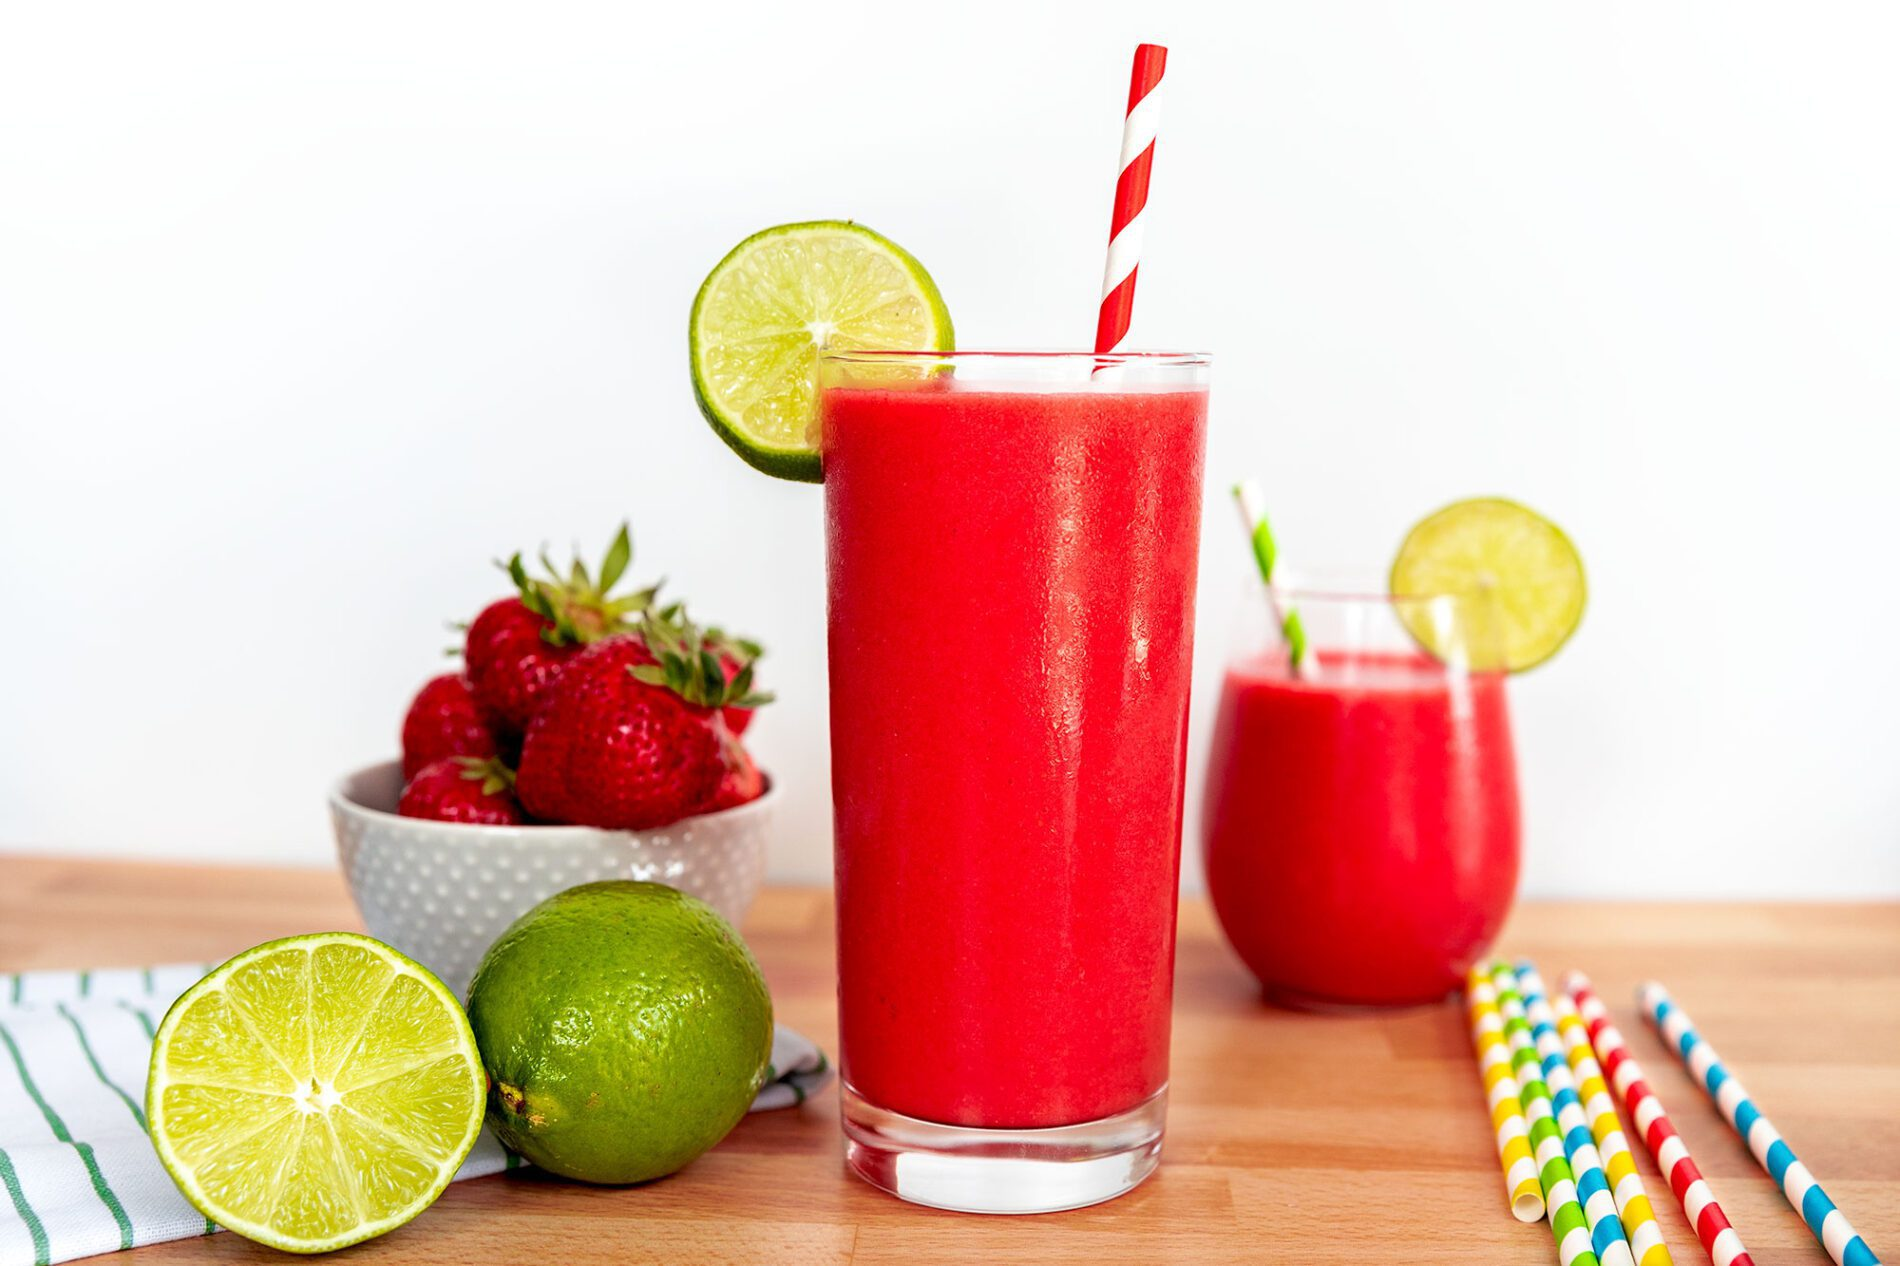 glasses of non-alcoholic strawberry daiquiri mocktail